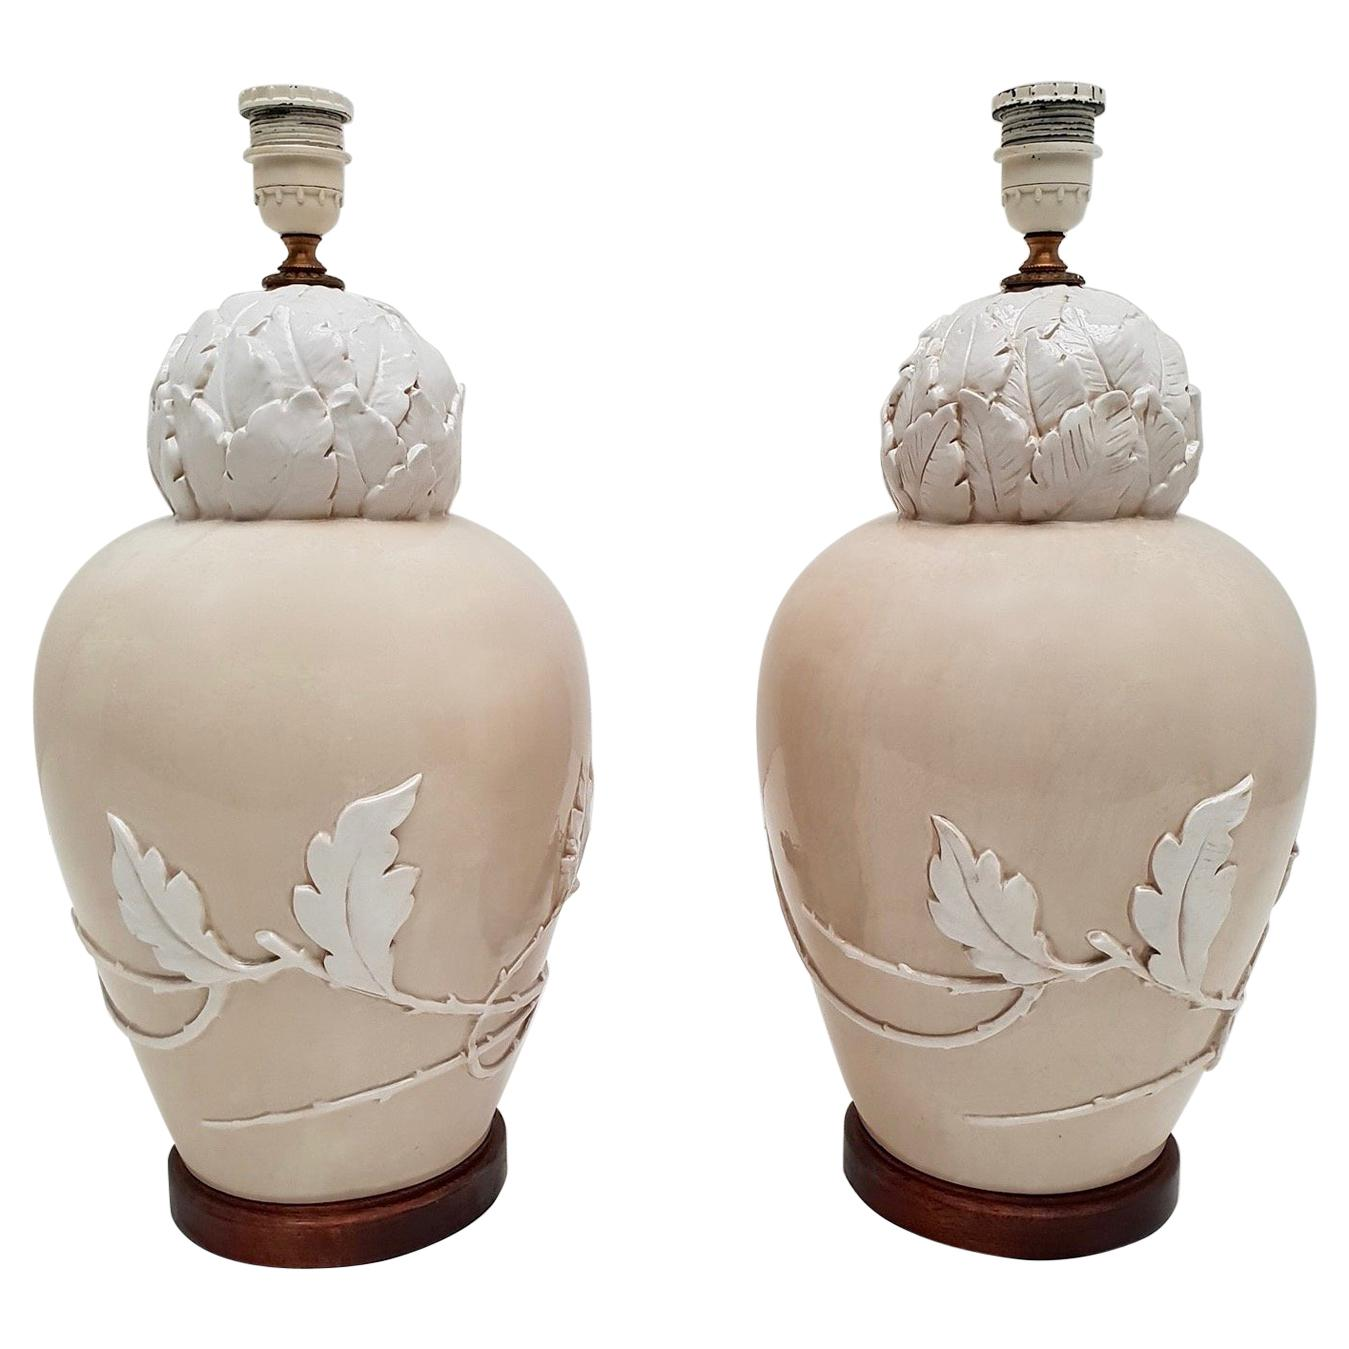 Pair of Mid-20th Century Ceramic Table Lamps